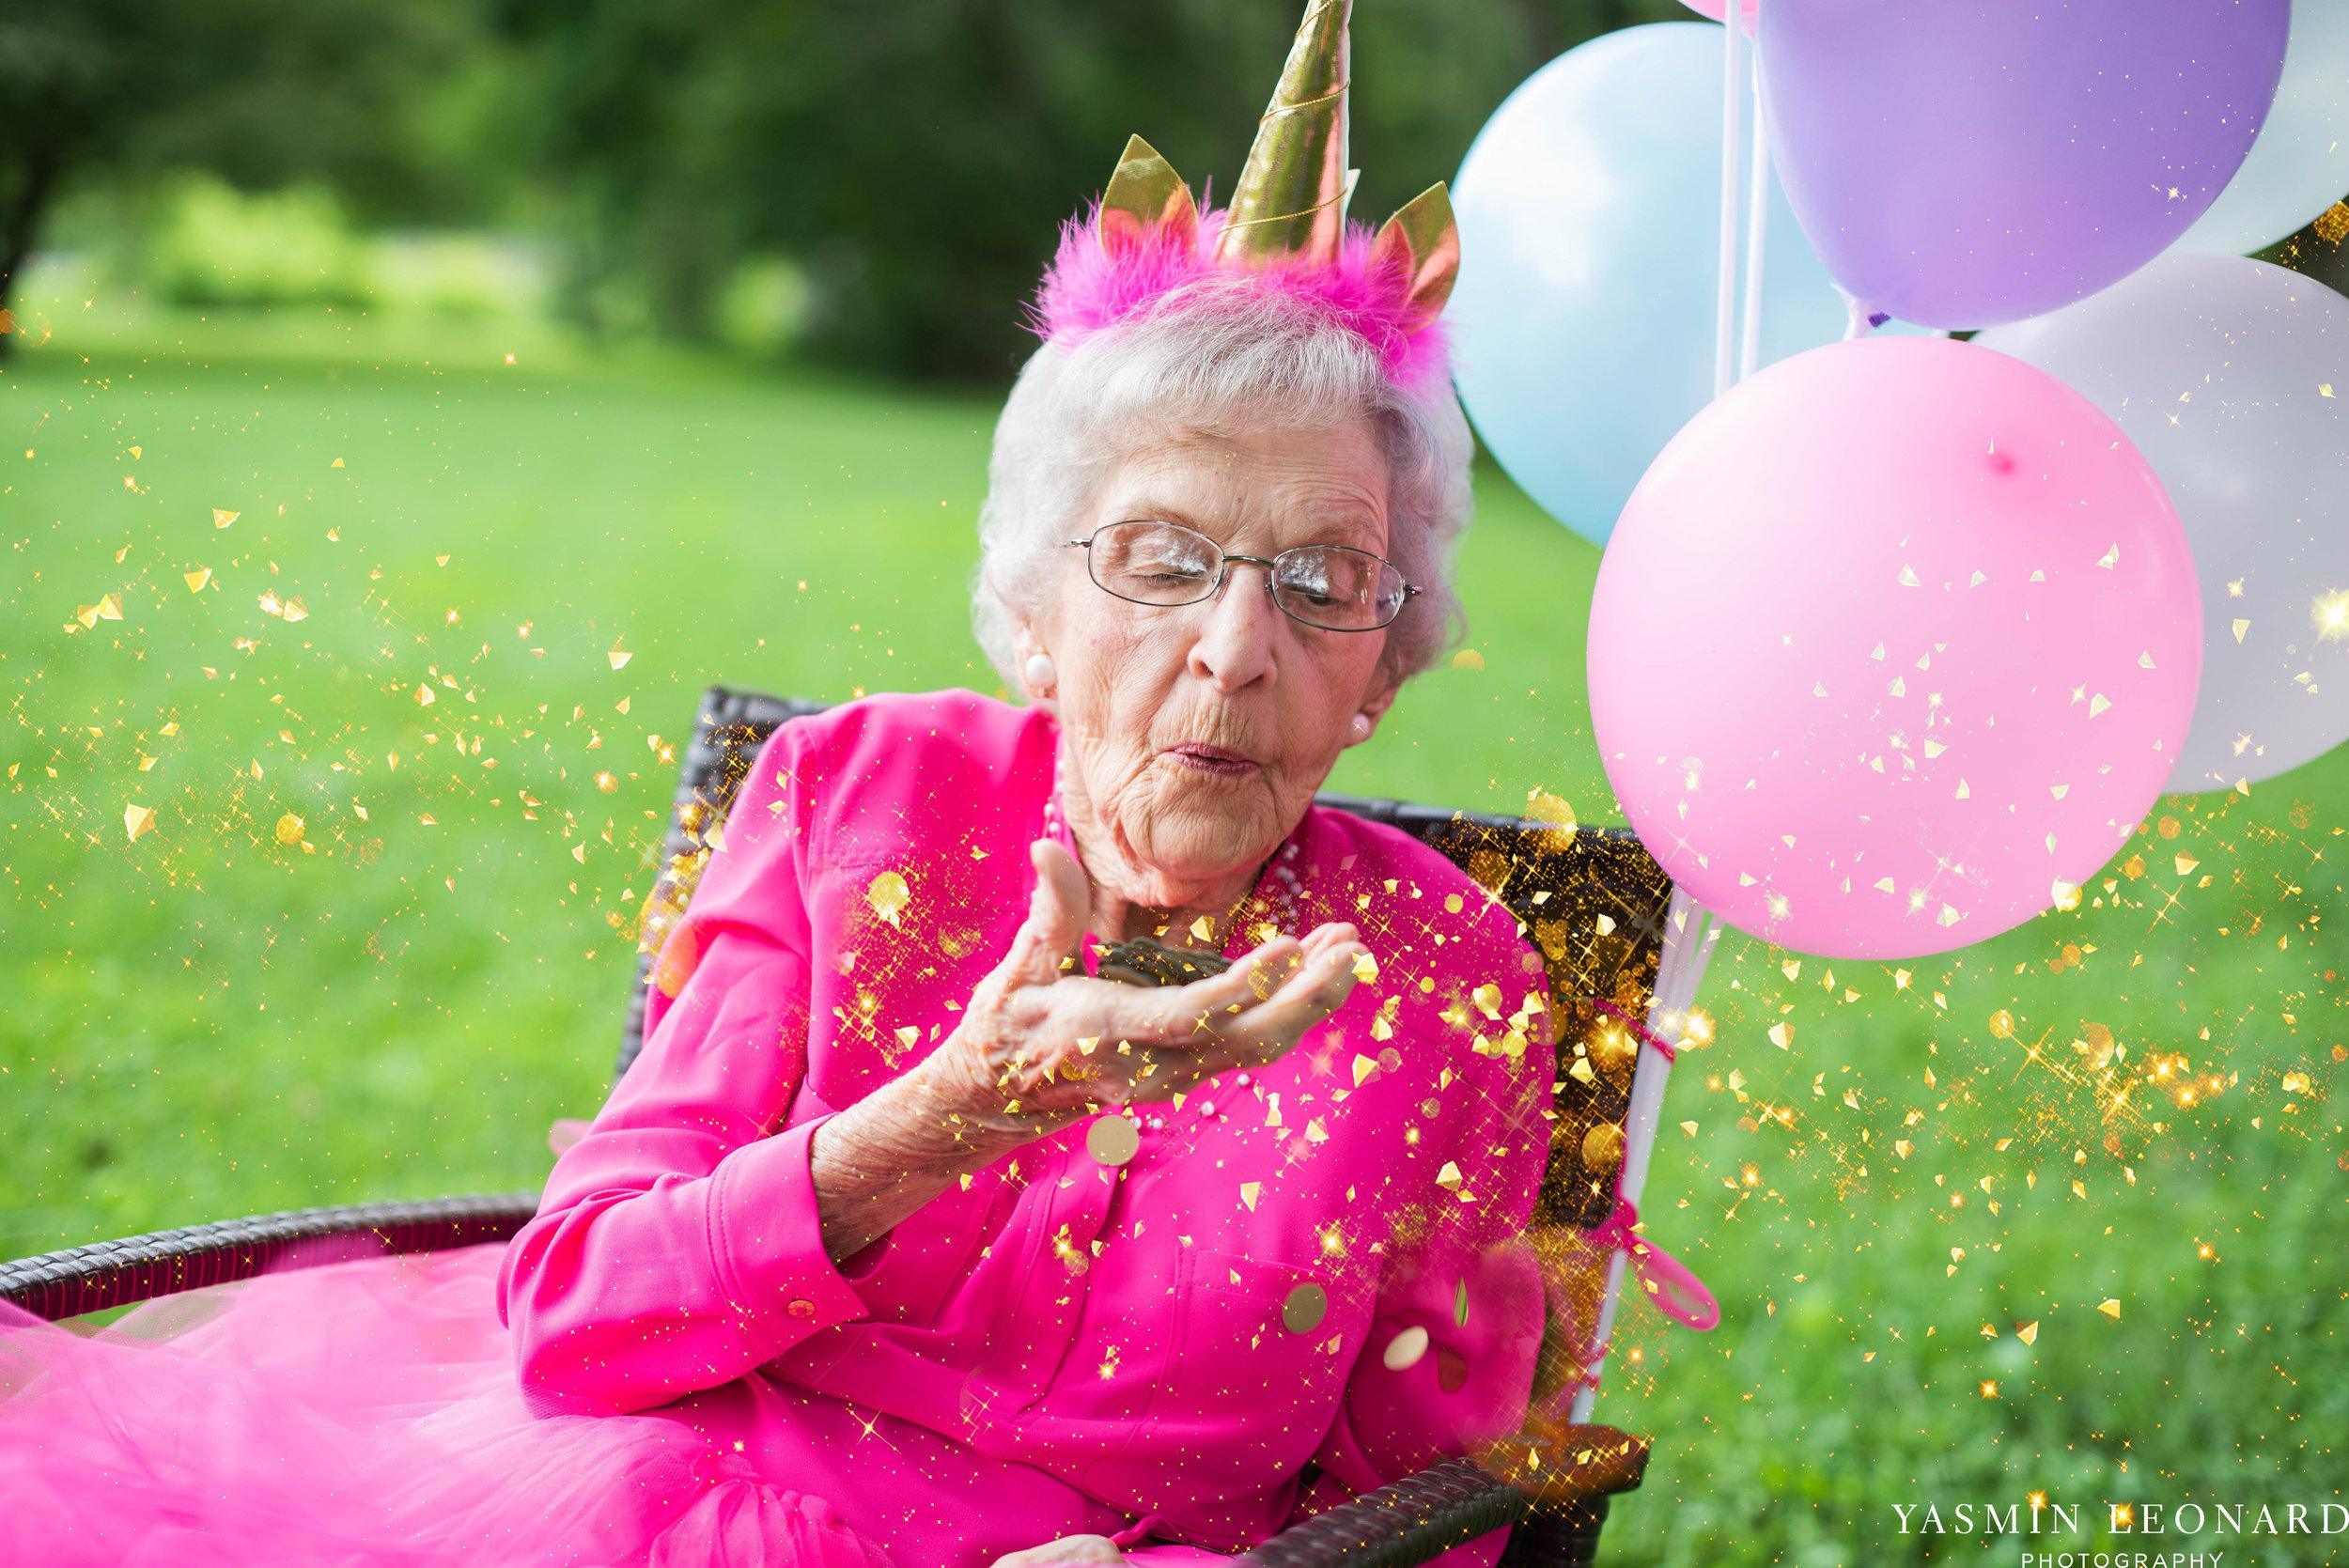 99 Year Old Birthday - Great Grandma Birthday Session - Grandma Birthday Session - 99 years Old - Adult Birthday Session - Four Generations-3.jpg